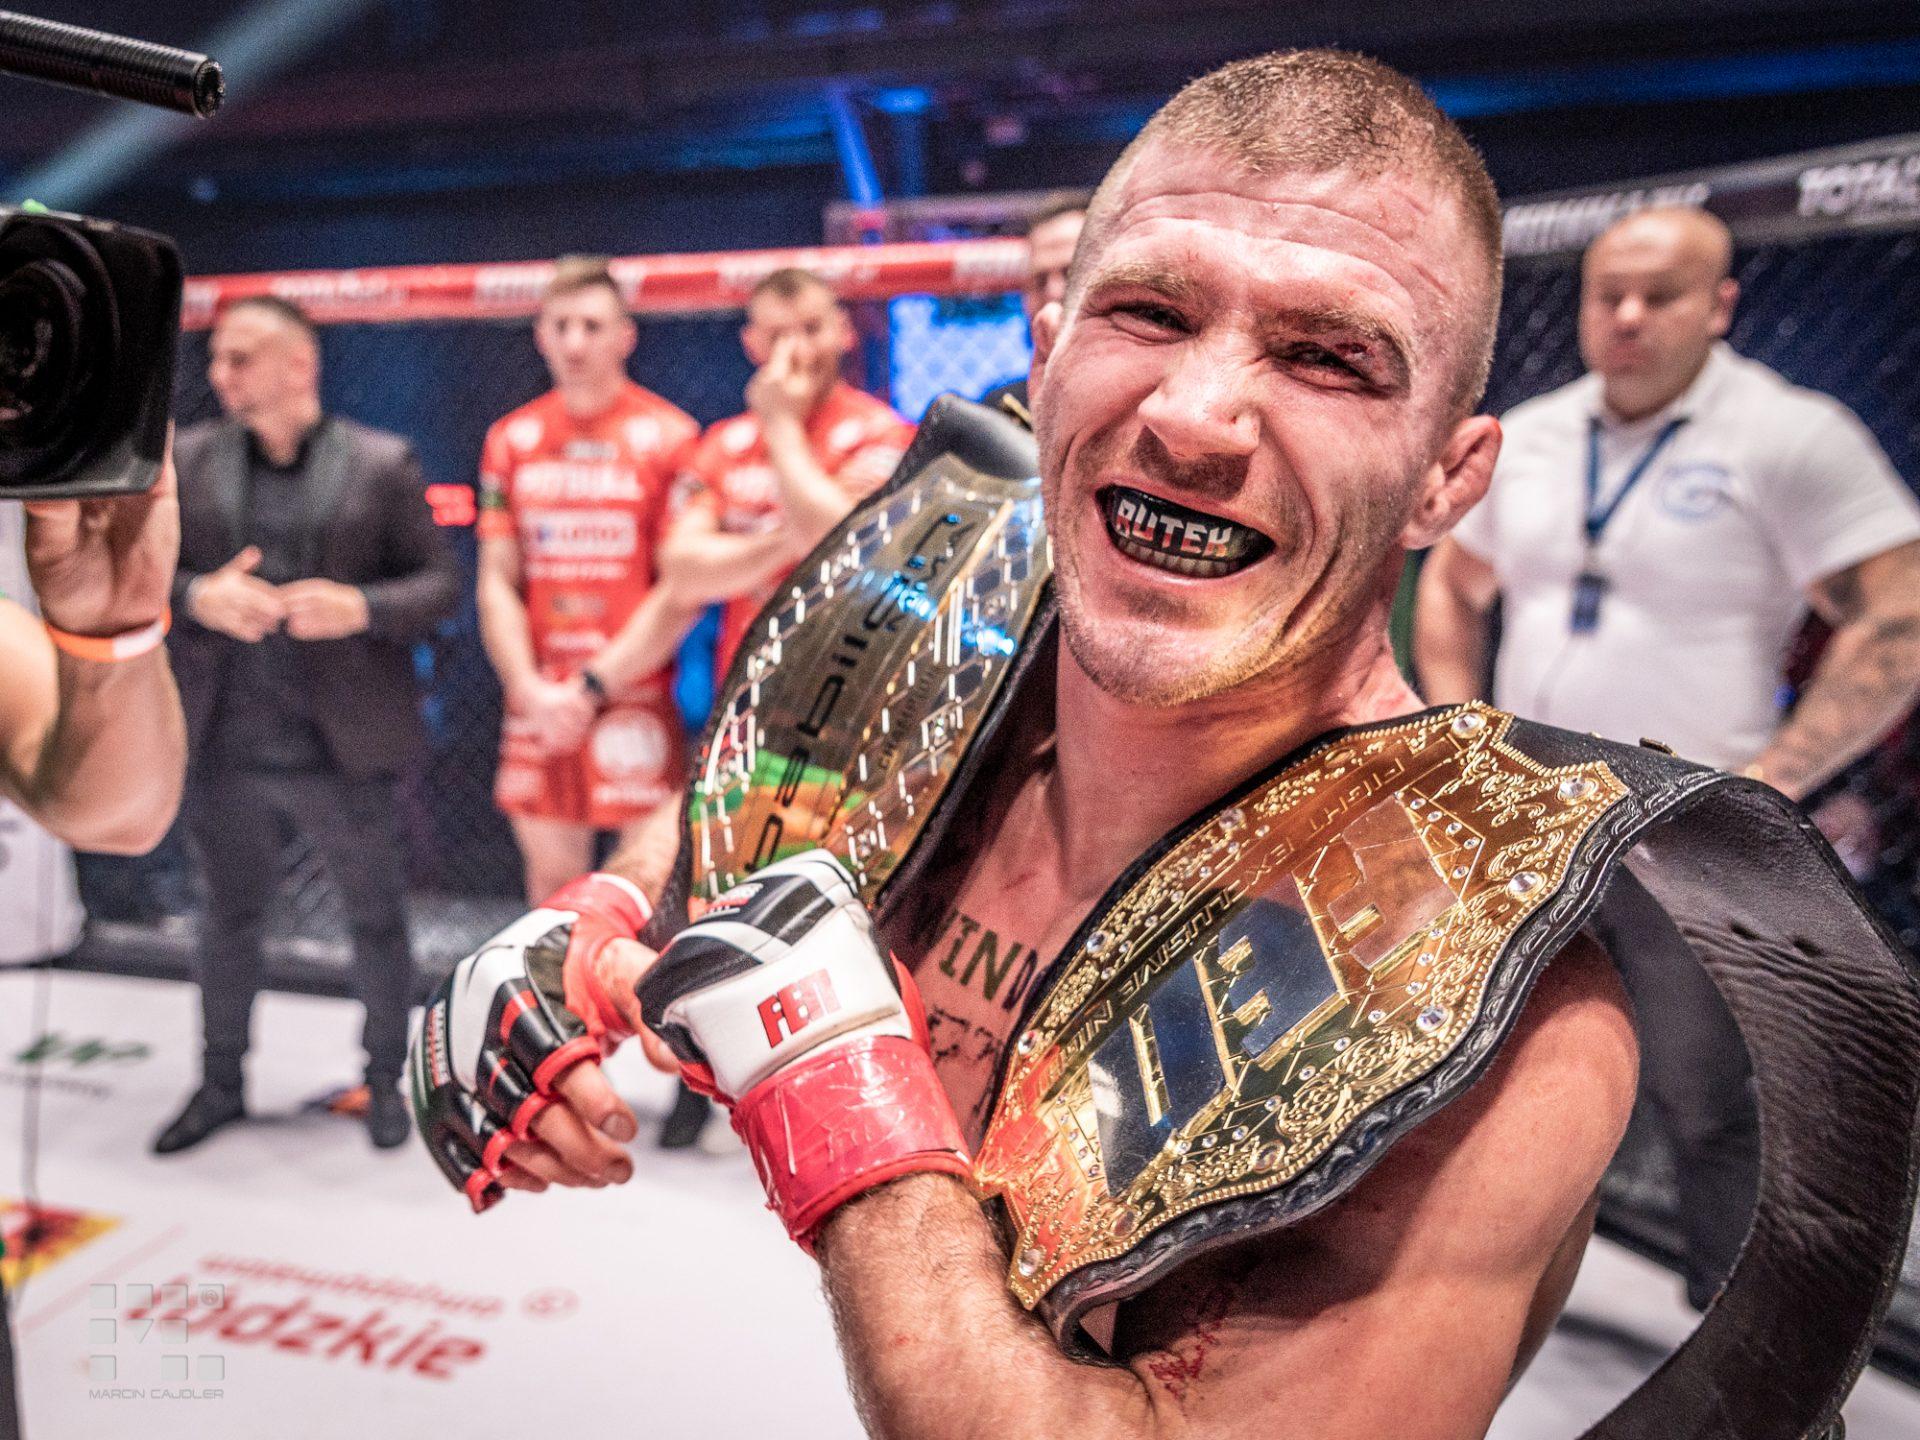 FEN 31 Results: Daniel Rutkowski def. Adrian Zieliński via Unanimous Decision - FEN 31